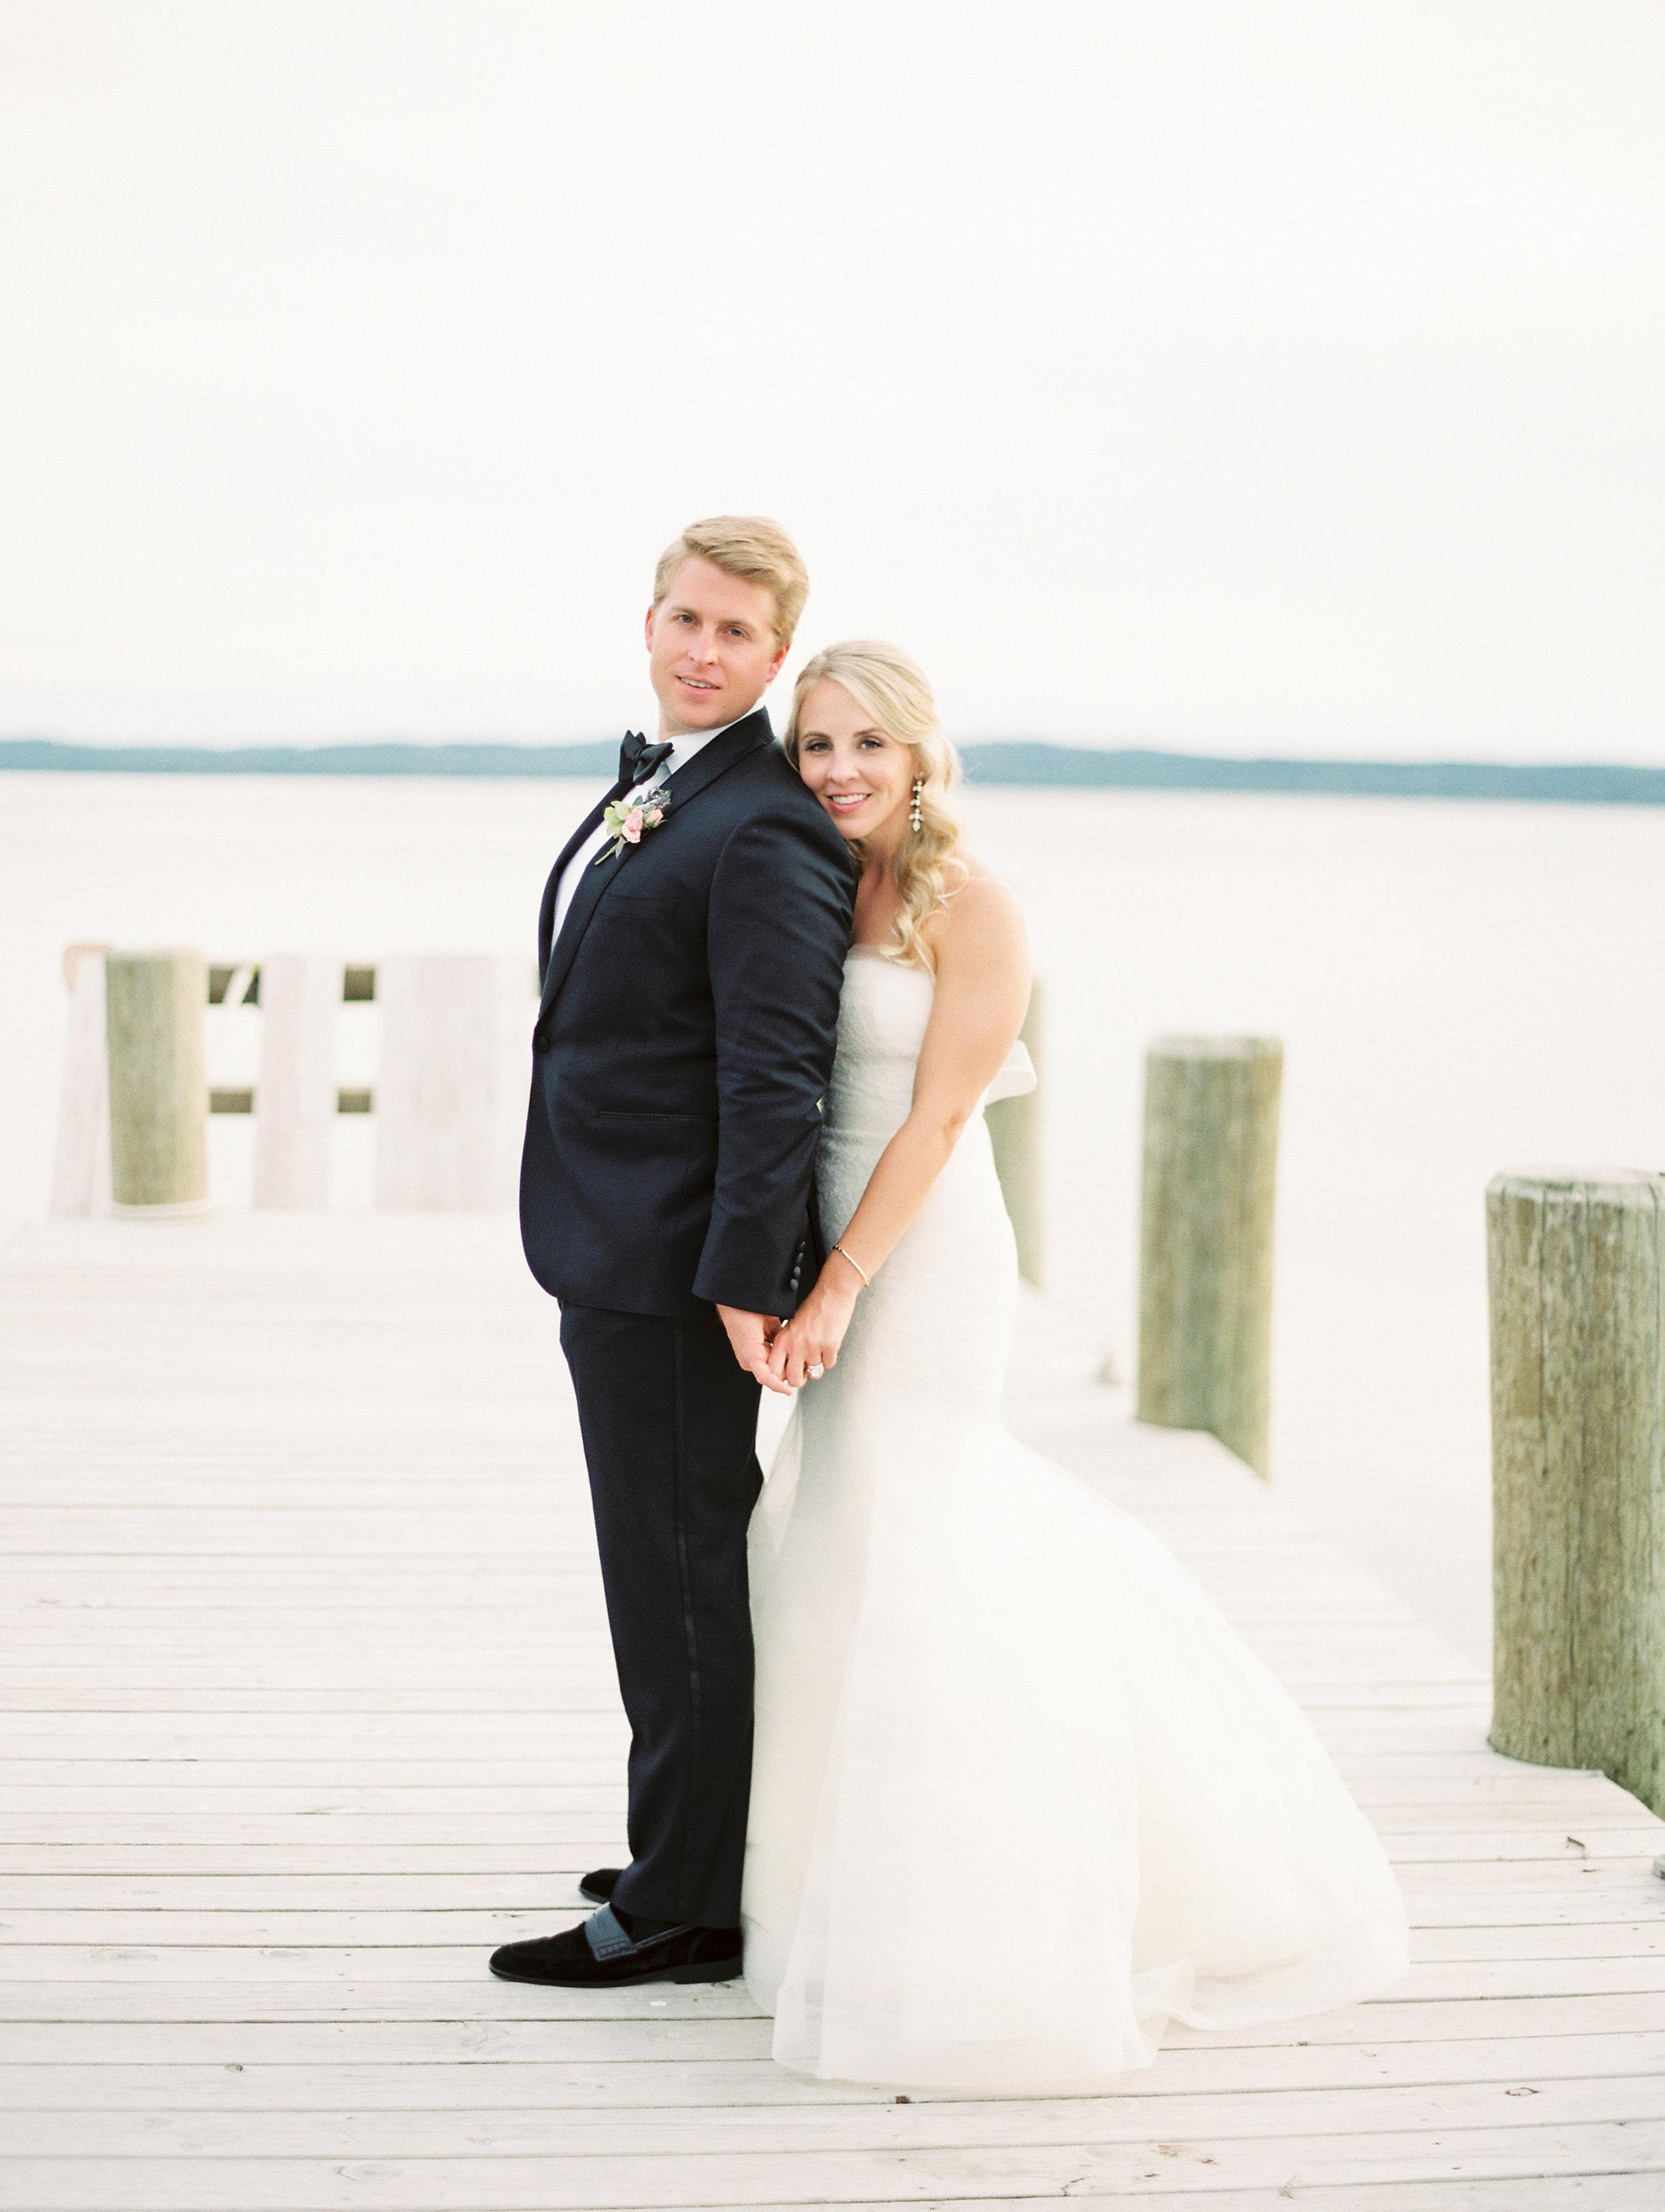 Coffman+Wedding+Bride+Groom+Sunset-54.jpg